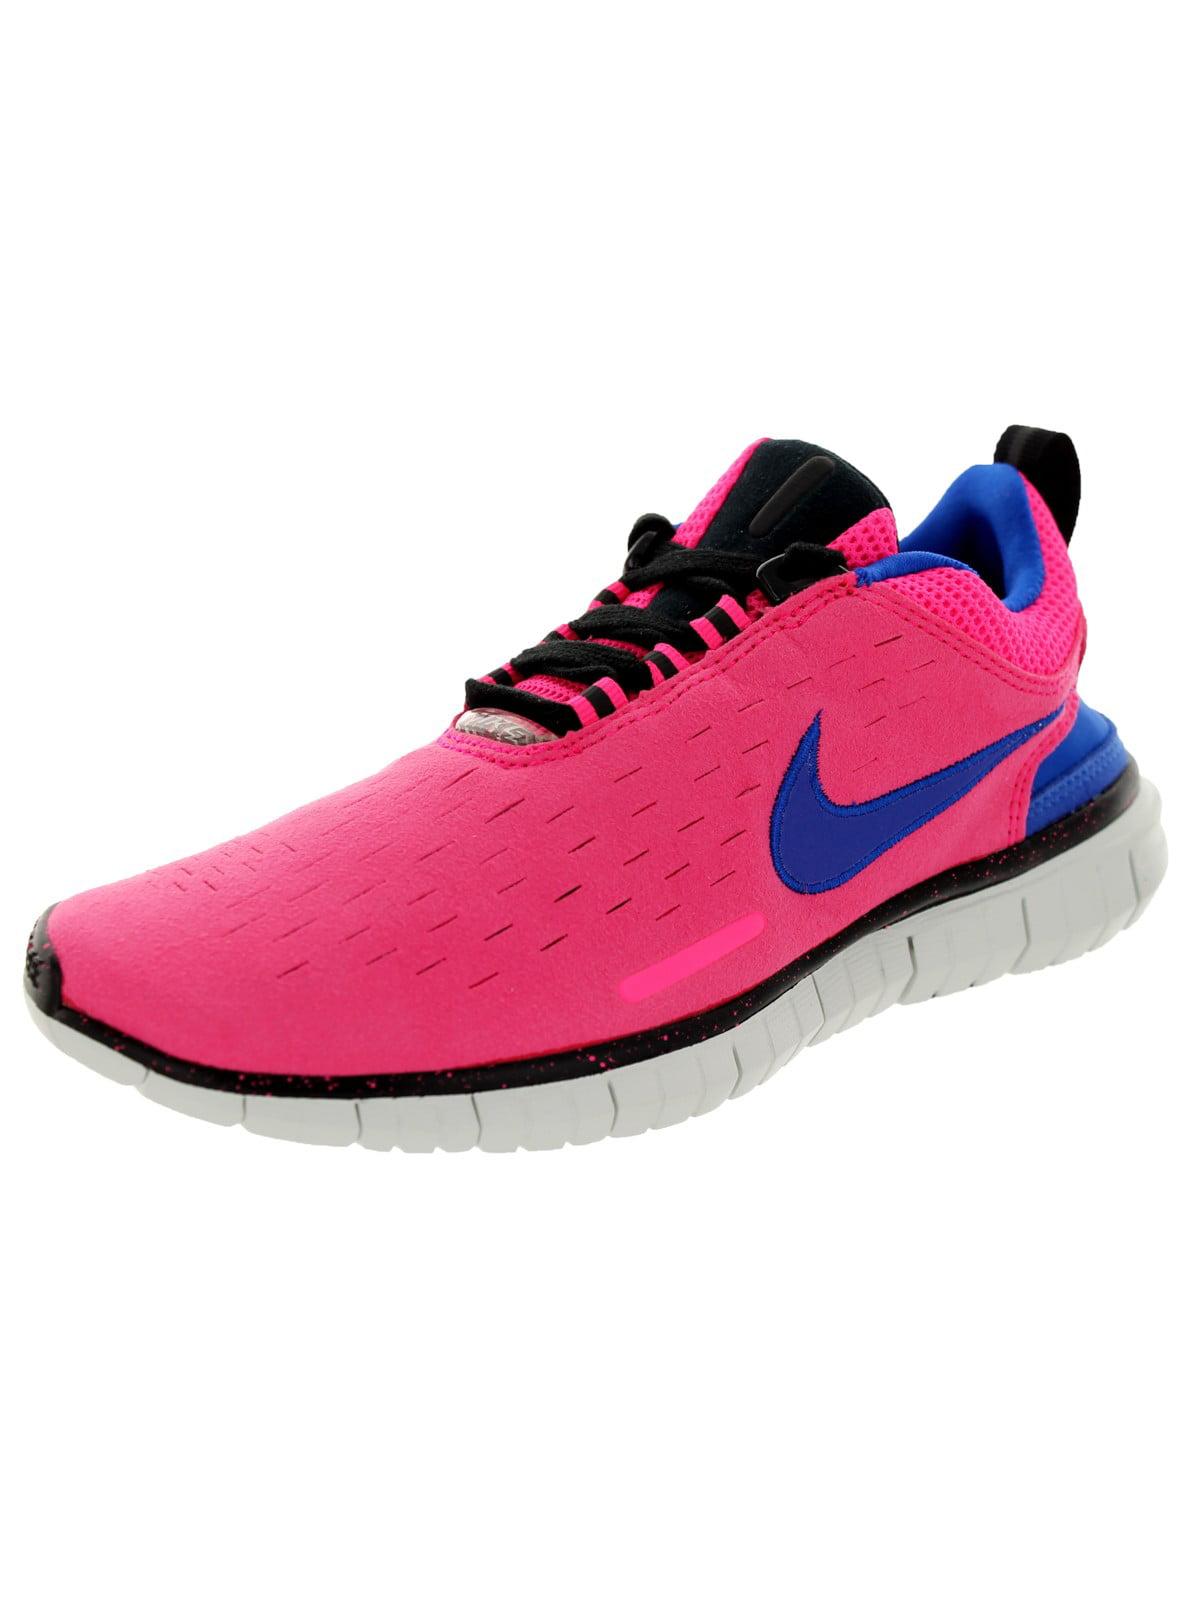 premium selection 1e3f0 74354 Nike - Nike Women's Free OG '14 Running Shoe - Walmart.com